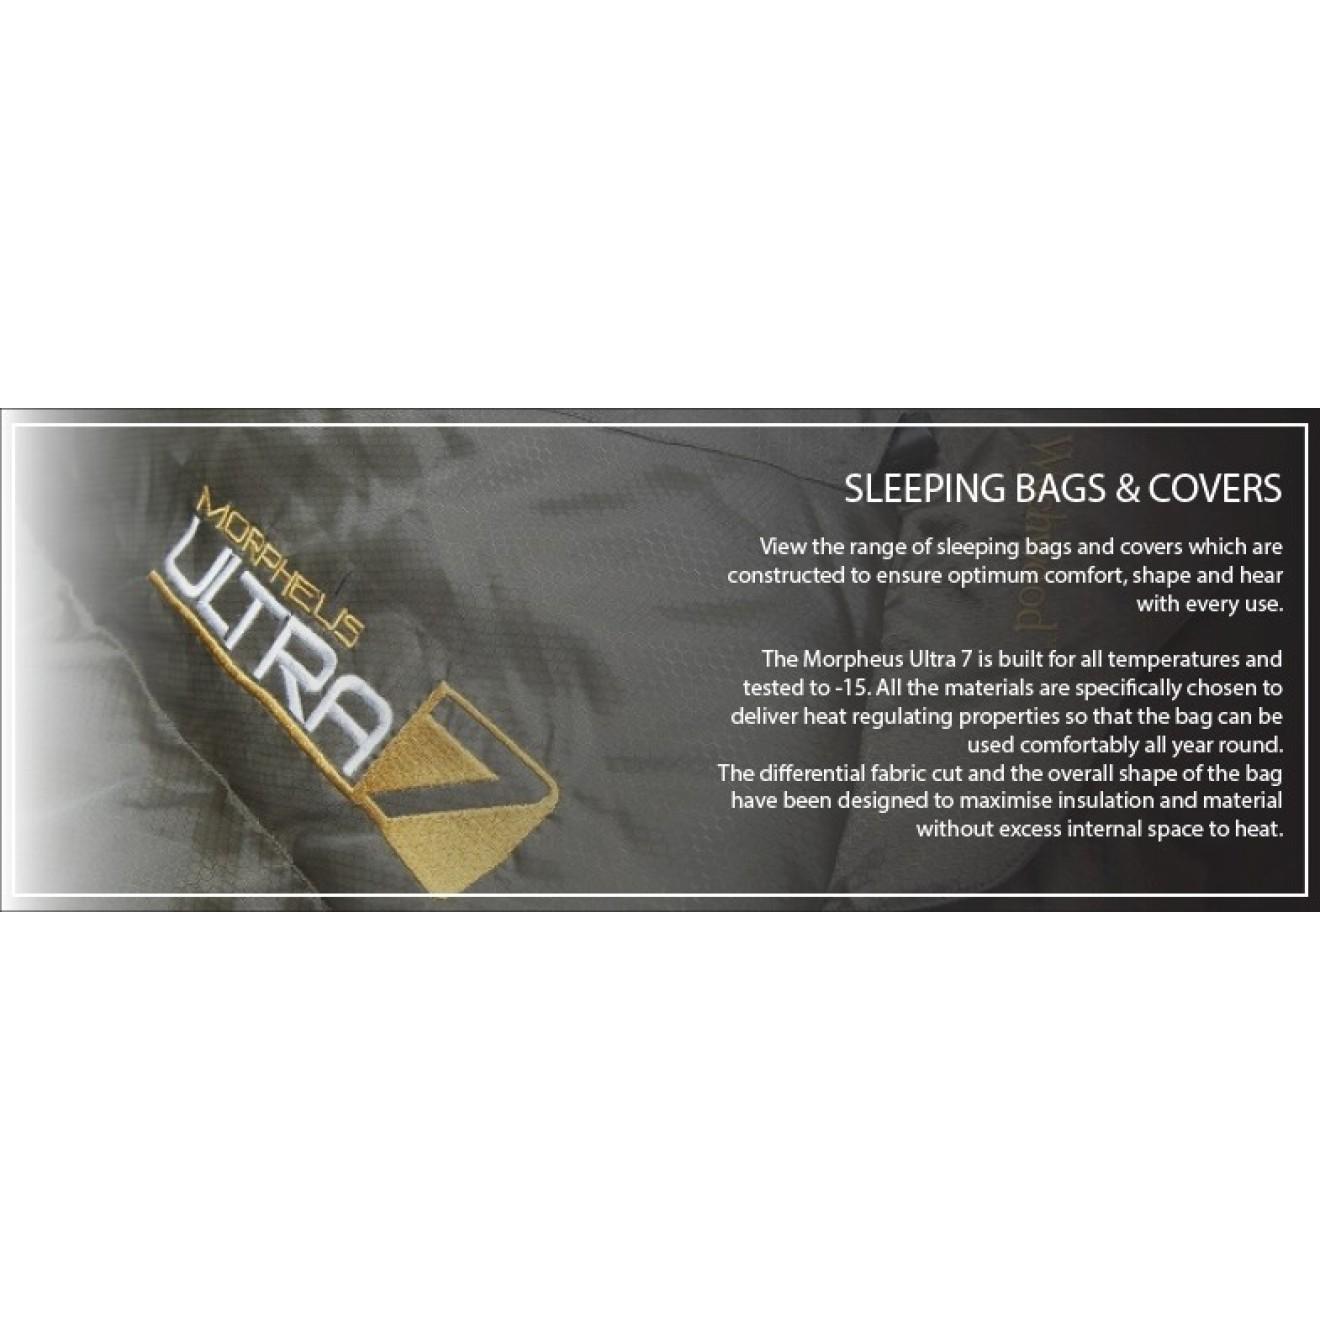 Wychwood Morpheus ULTRA 7 Sleeping Bag, Carphunter&Co Shop ...